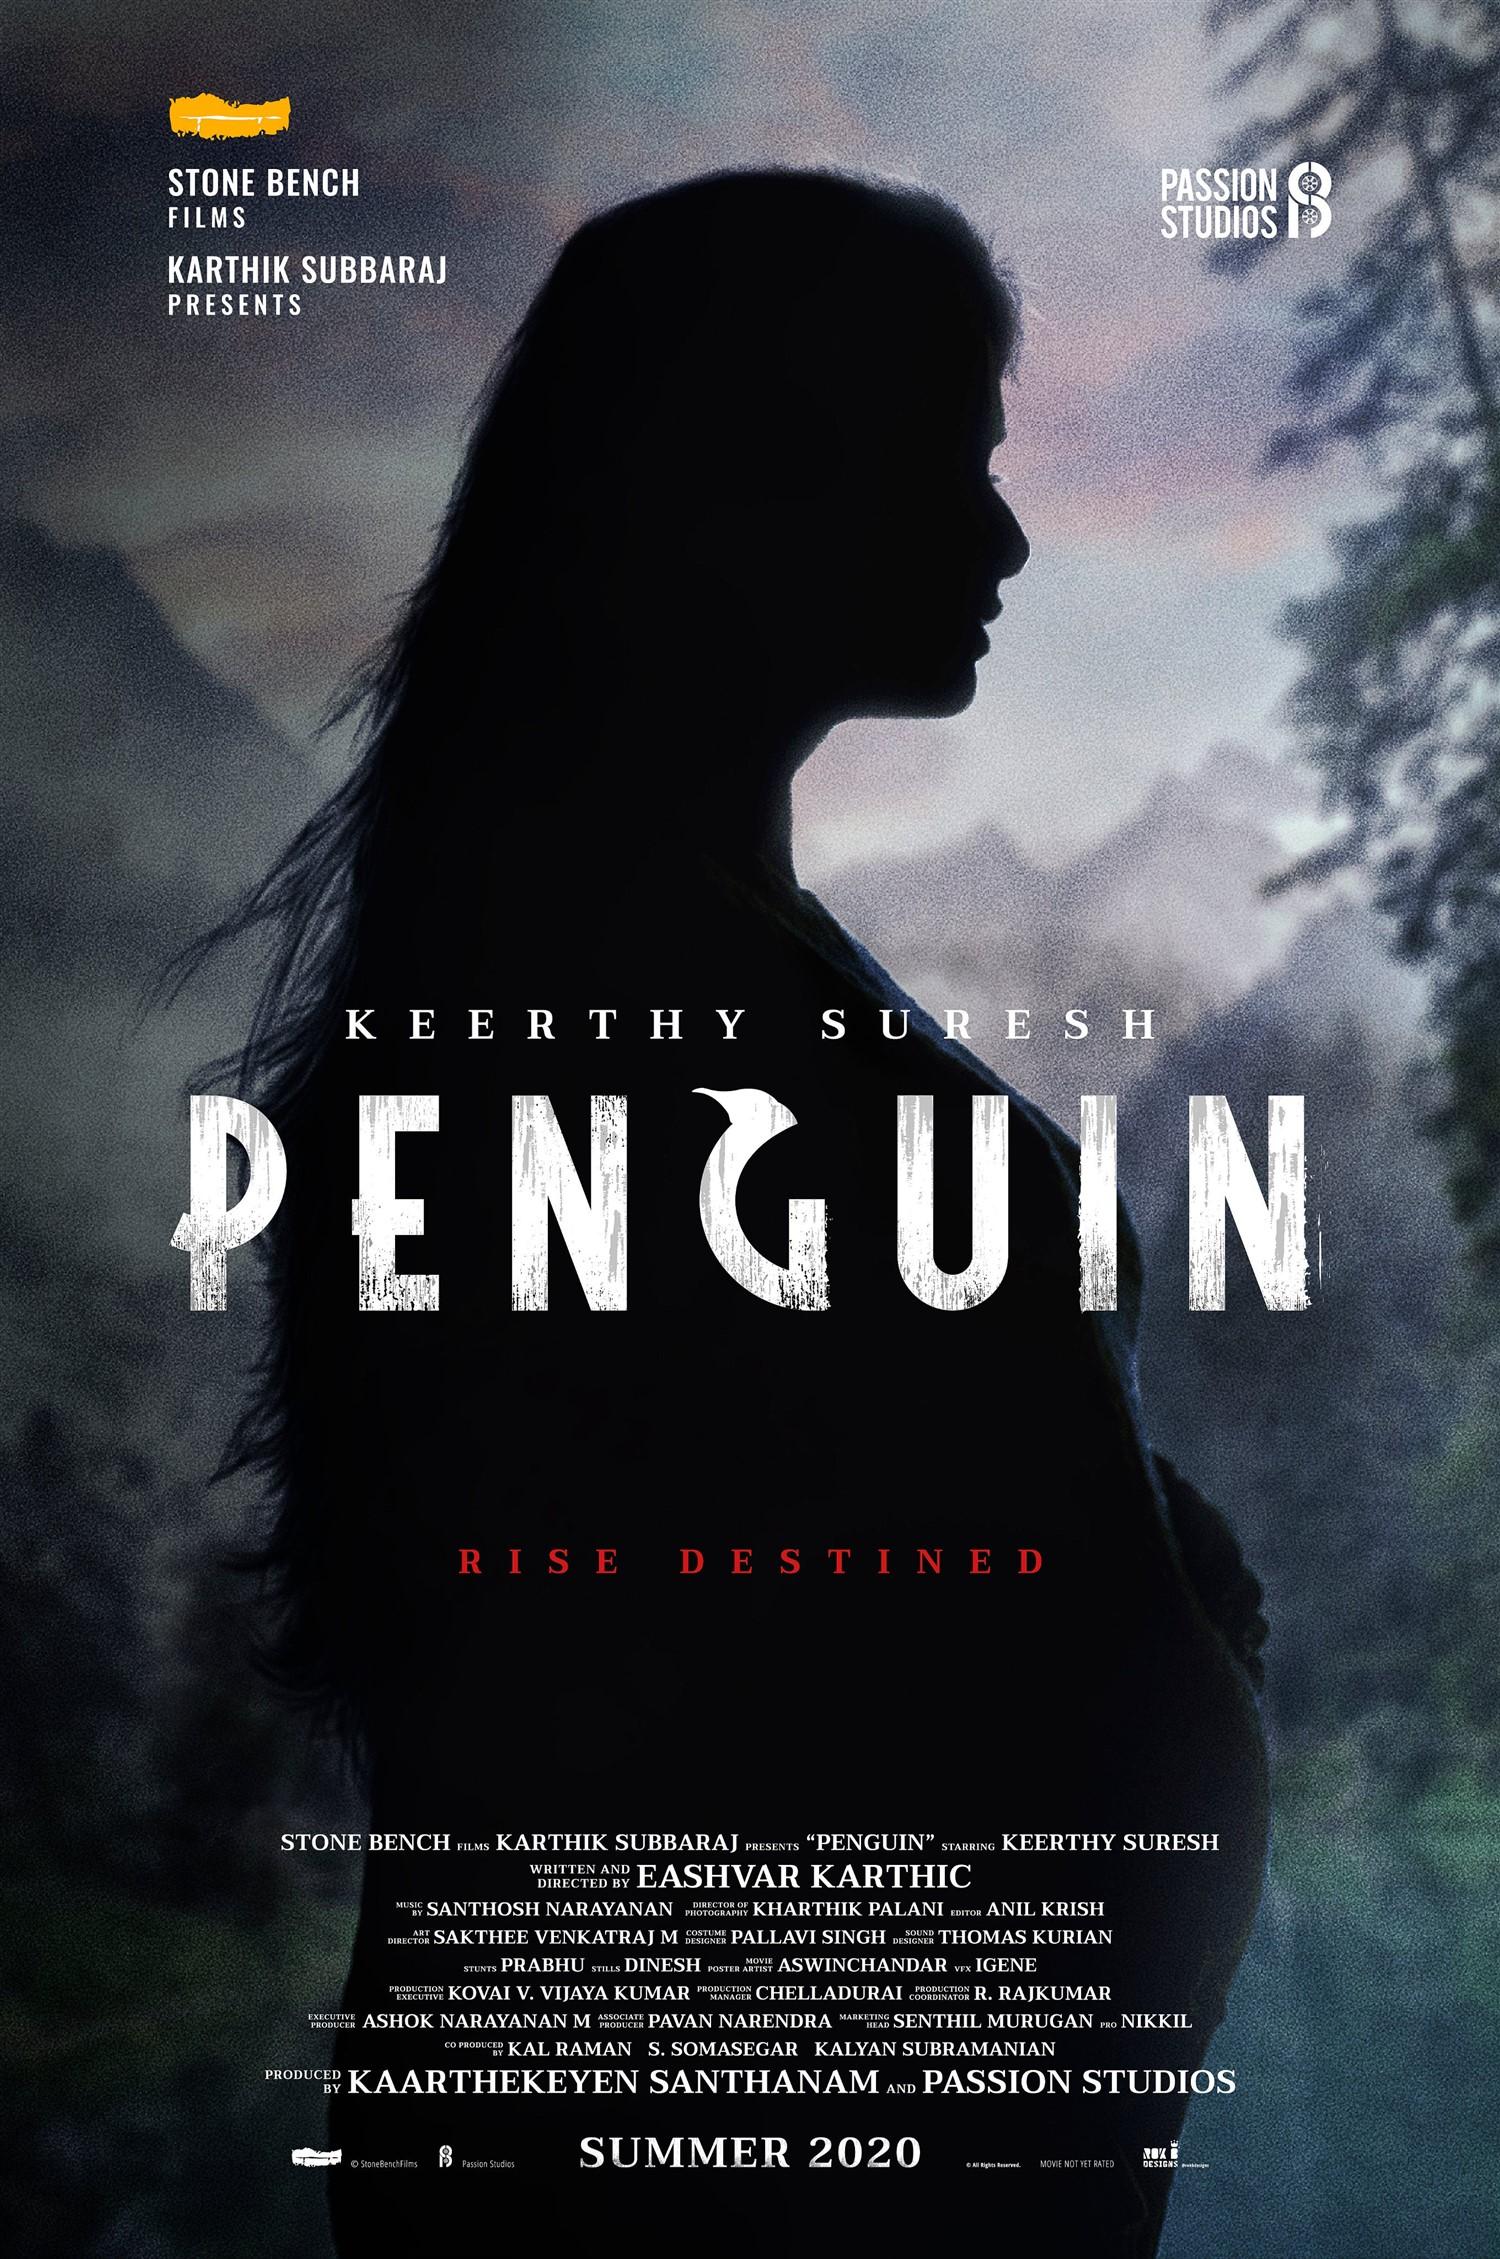 Actress Keerthi Suresh Penguin Movie Title Look Poster HD